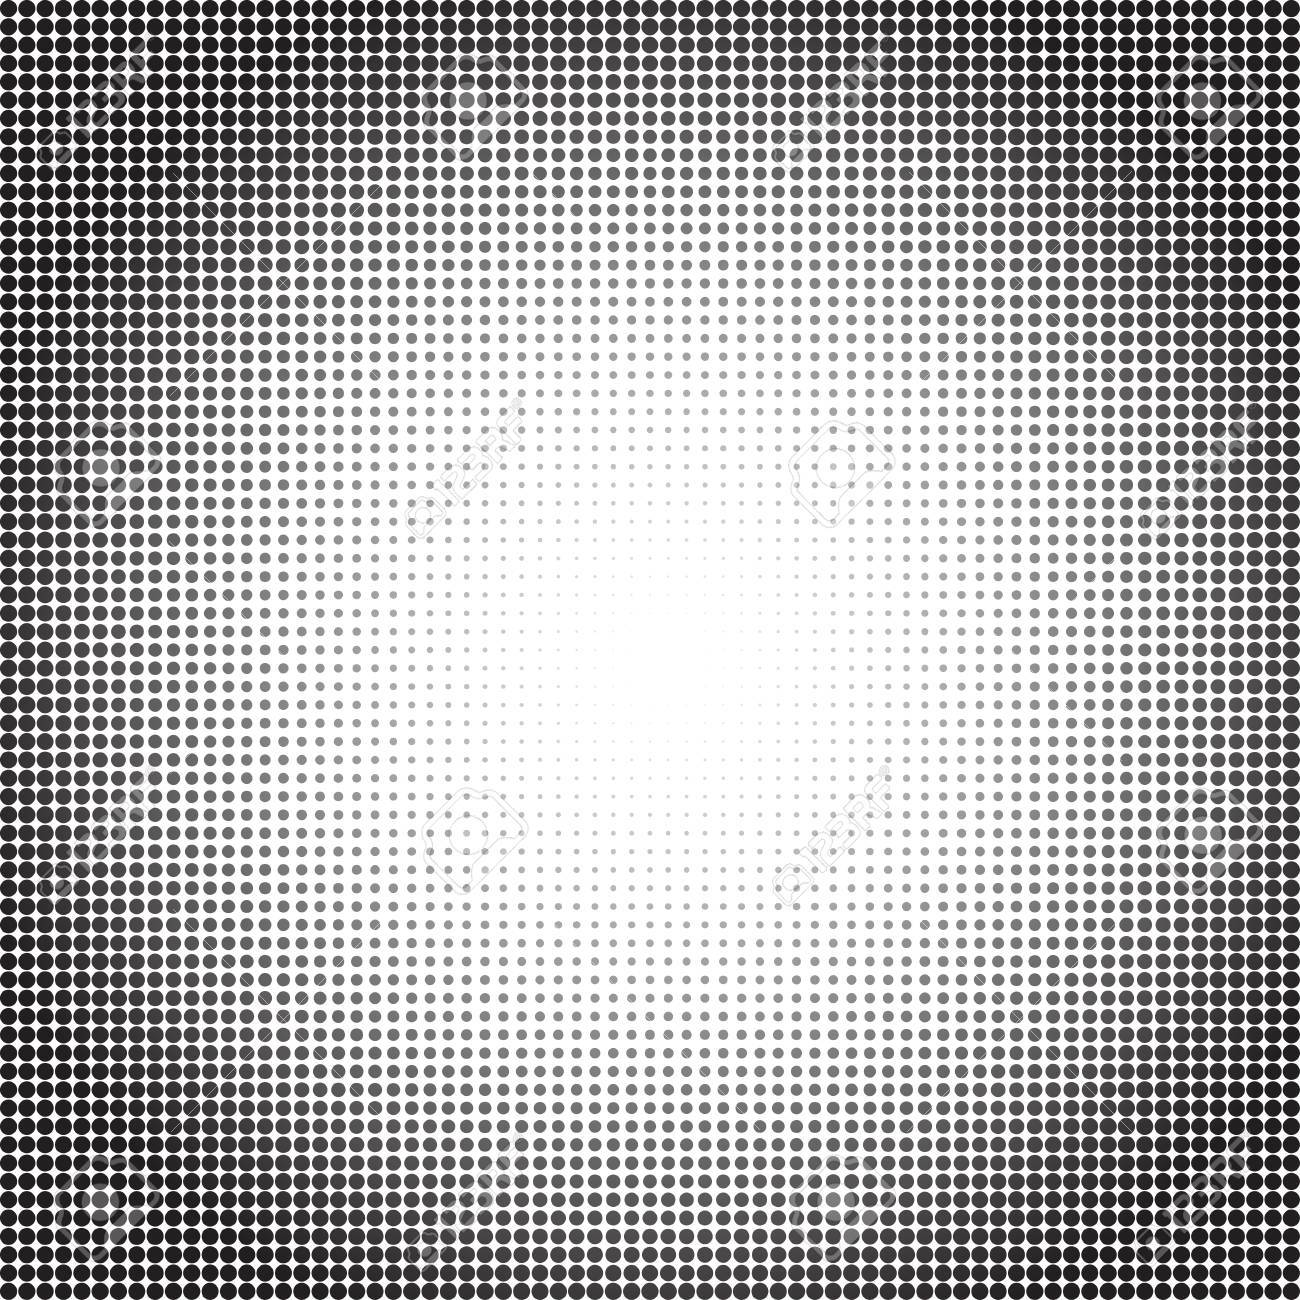 Circle art halftone dots in circle form royalty free cliparts circle art halftone dots in circle form stock vector 59287826 falaconquin